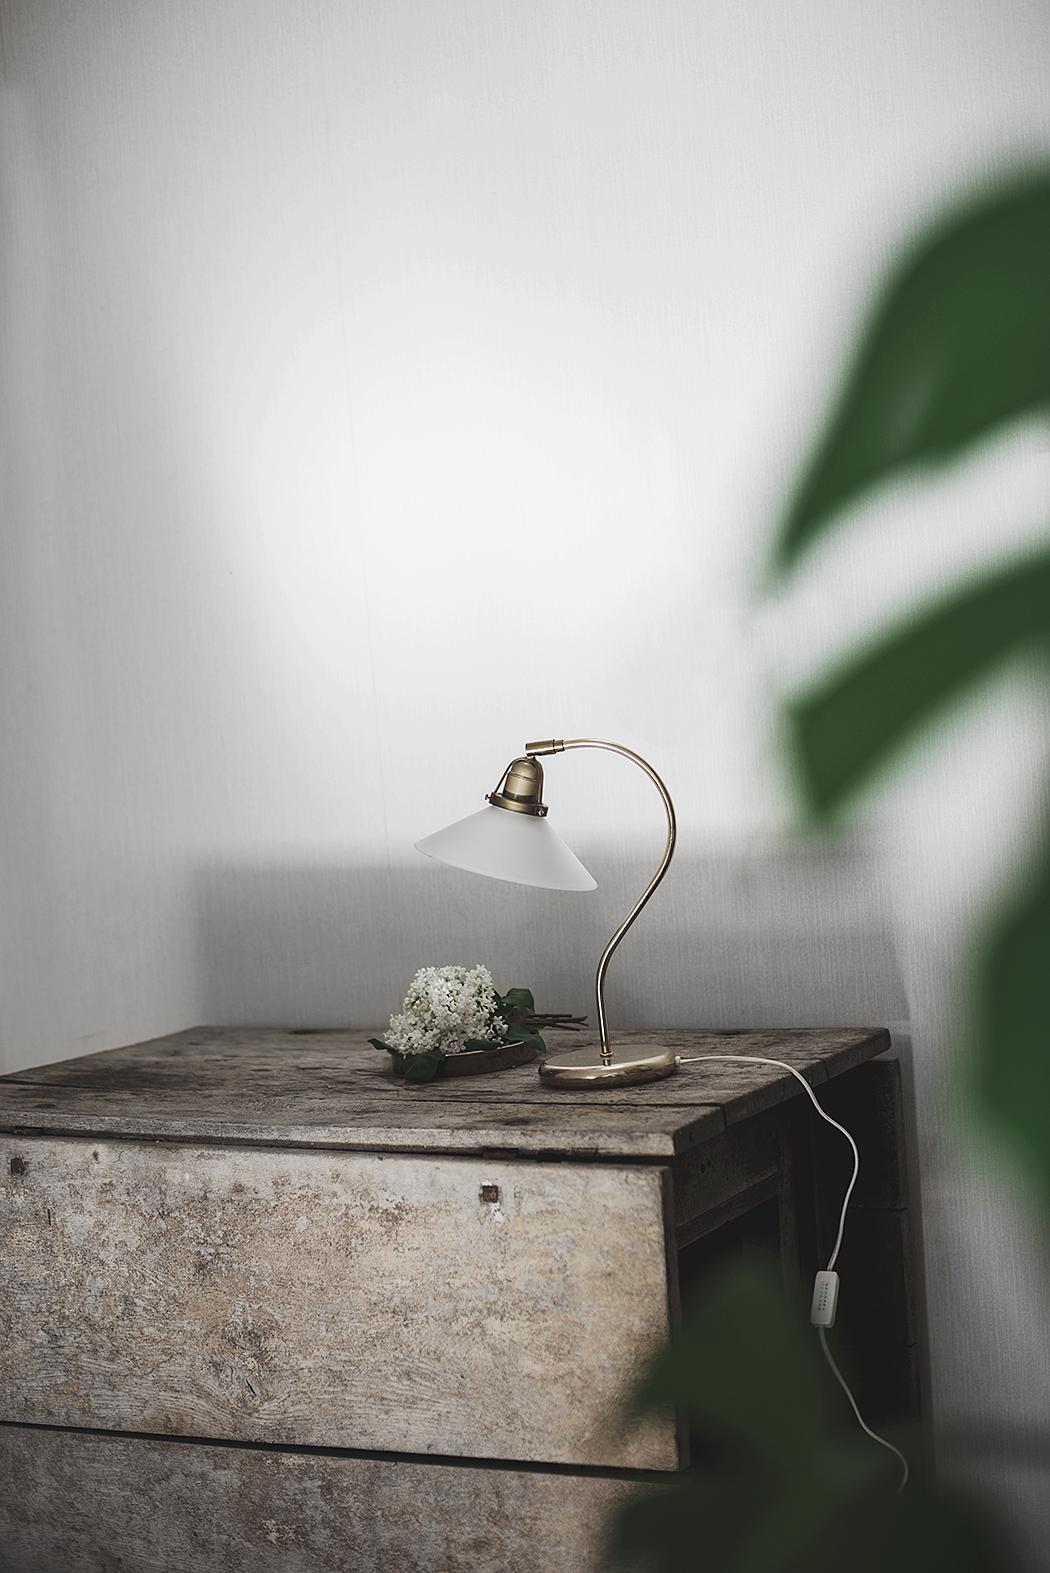 secondhand – skomakarlampa